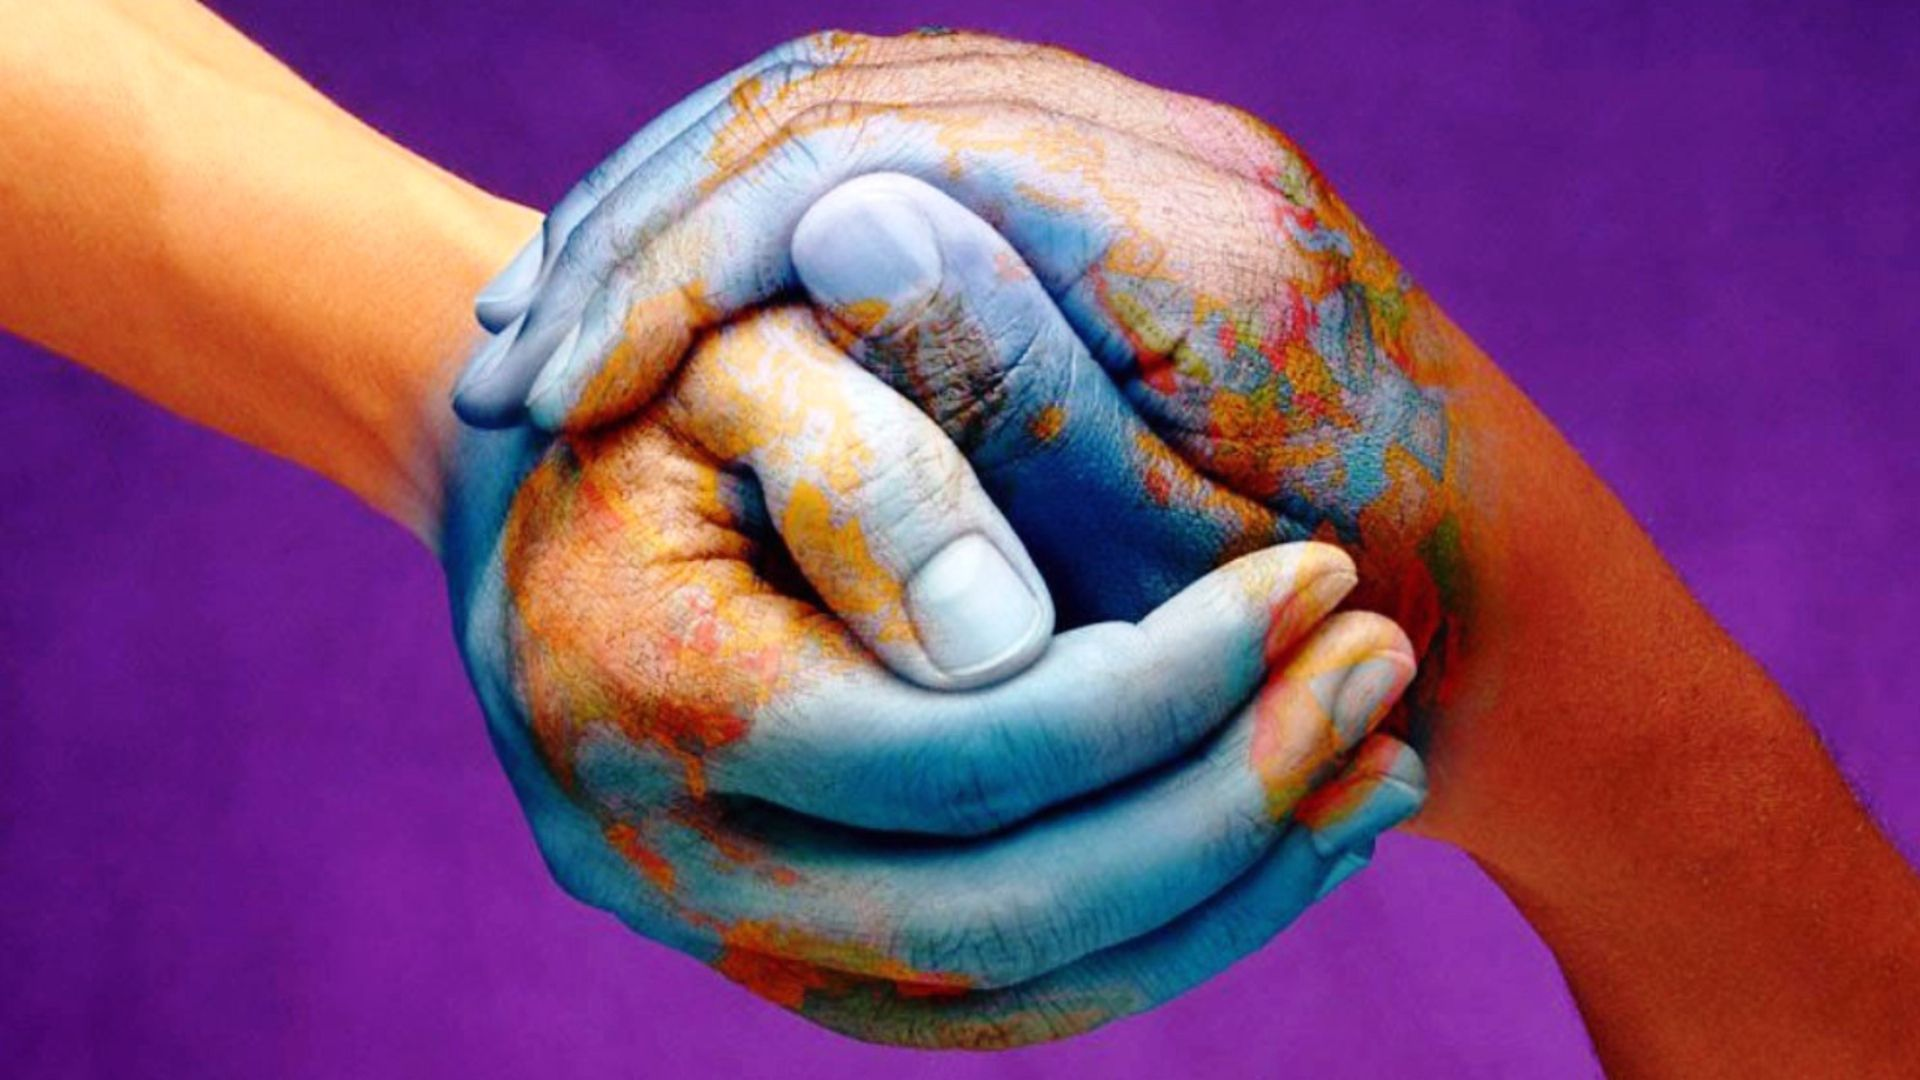 Le 20 frasi più belle dedicate alla pace